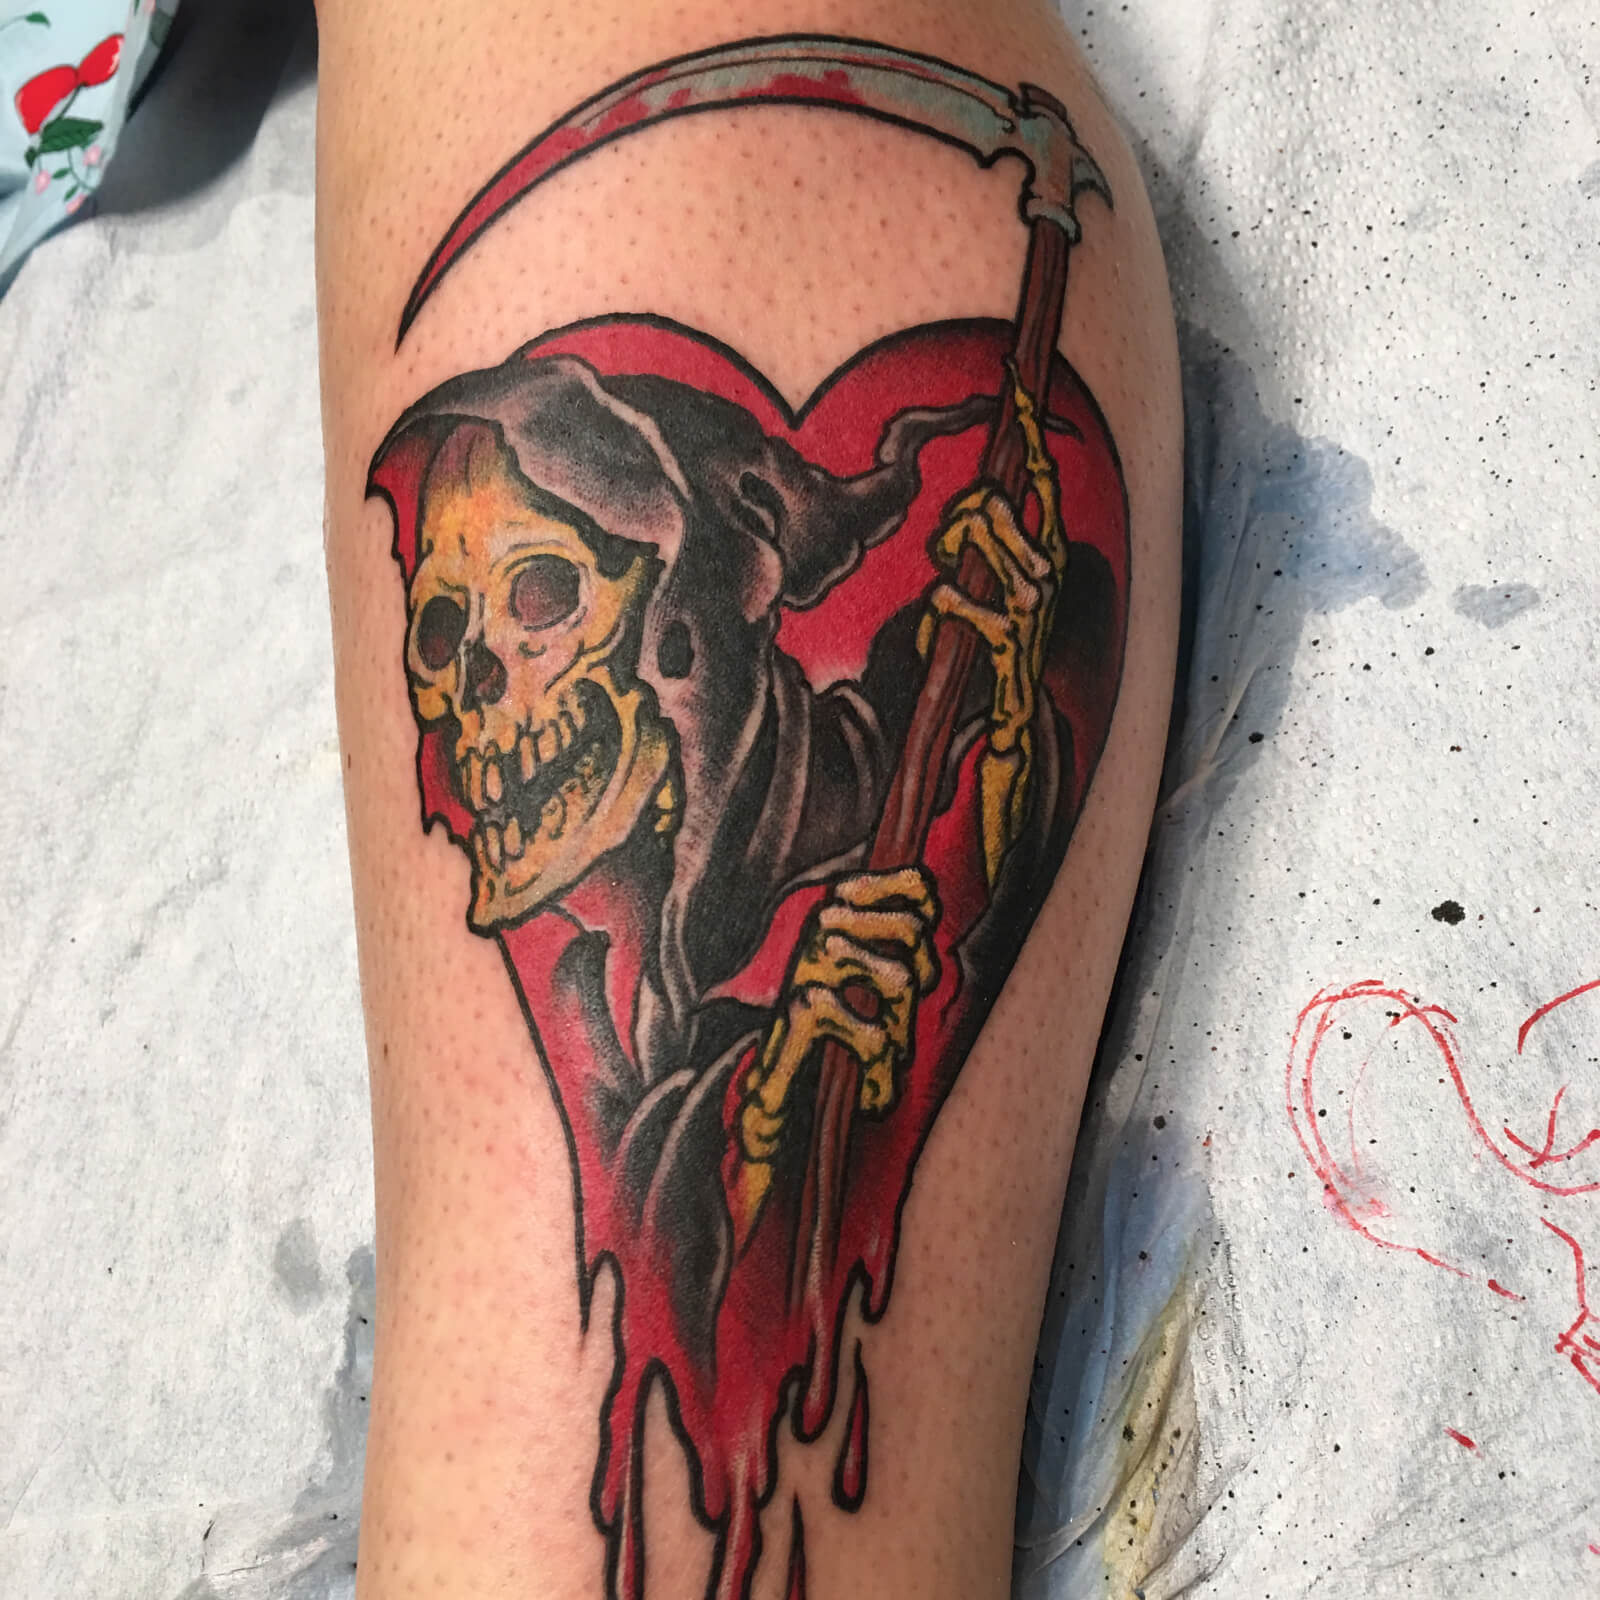 scott-sylvia-black-heart-tattoo-1